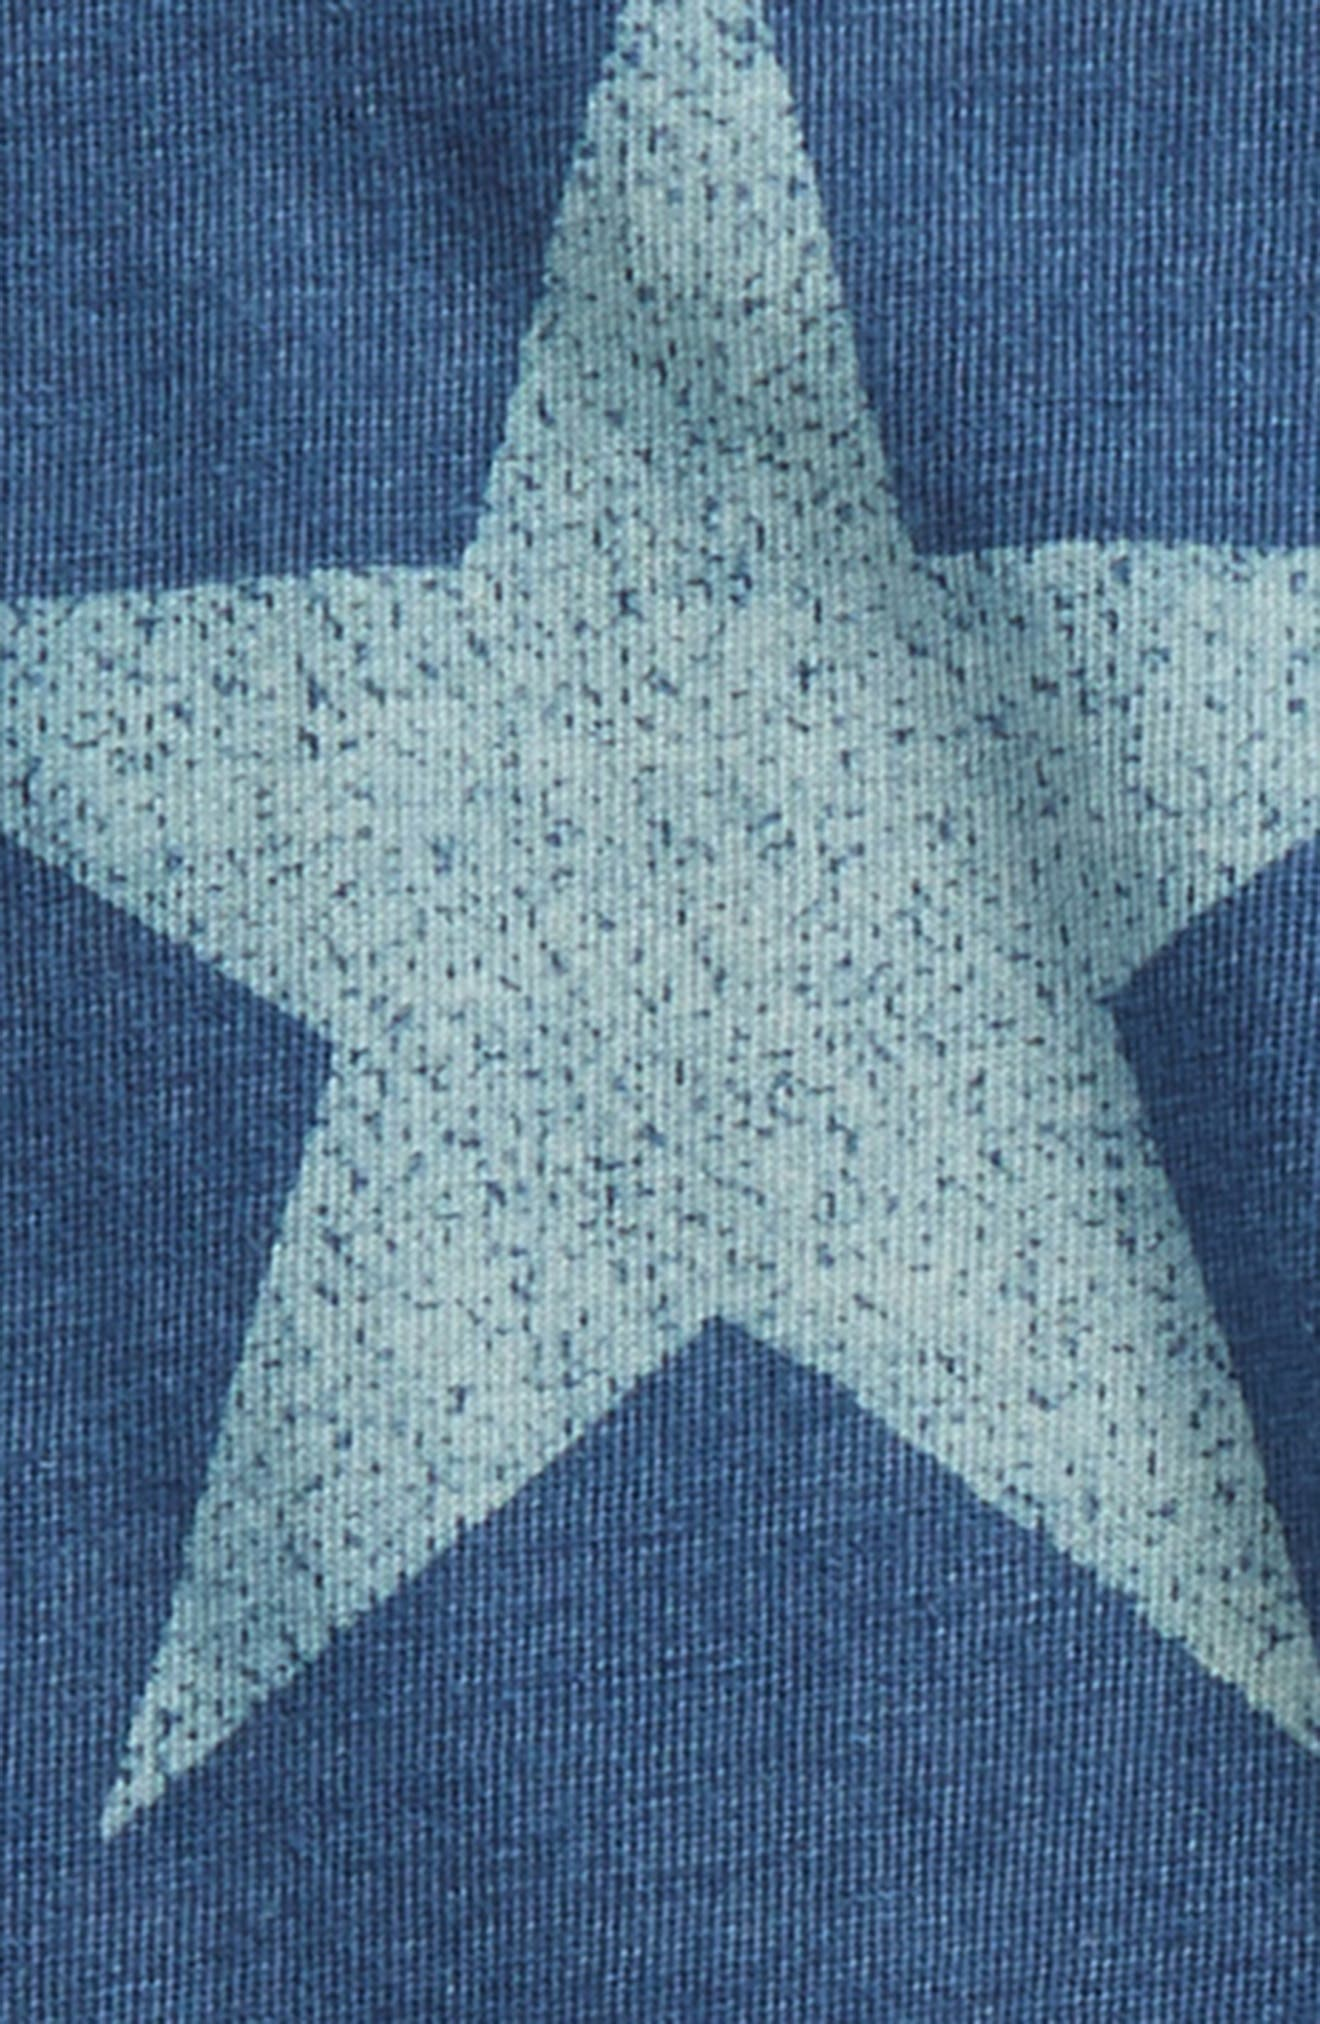 Star Bodysuit & Pants Set,                             Alternate thumbnail 2, color,                             Blue Indigo Star